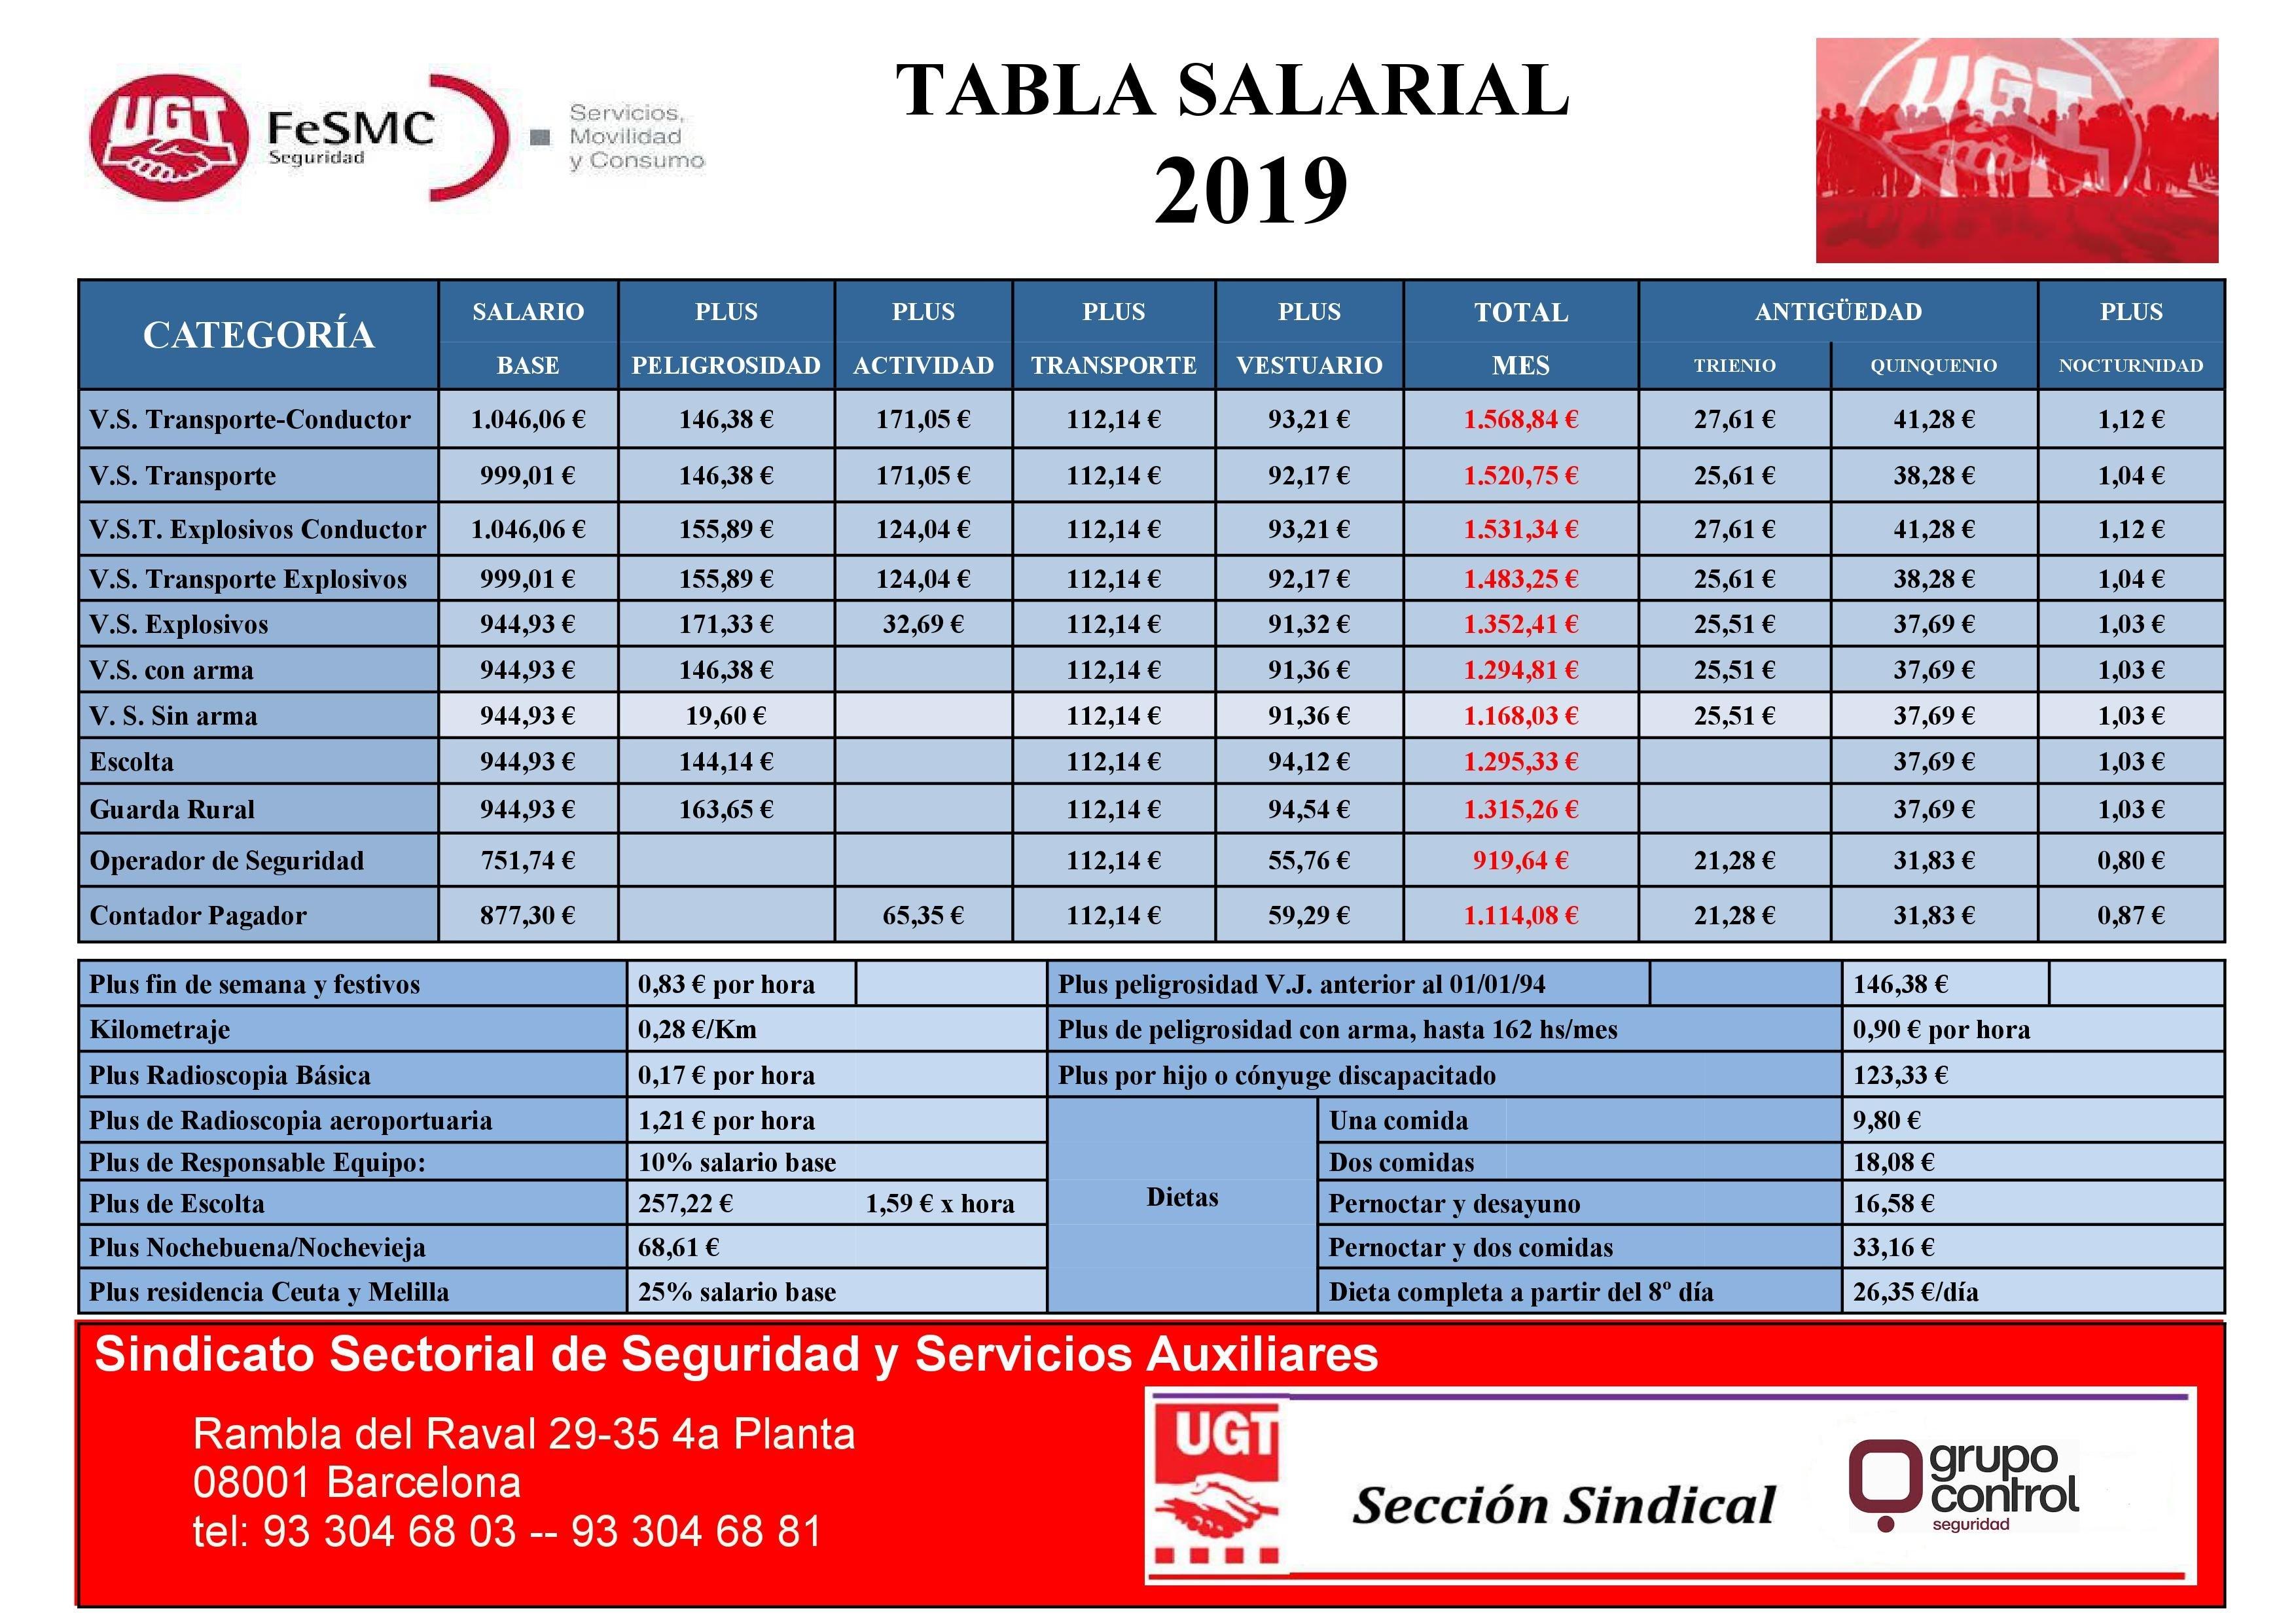 Tabla salarial 2019 grupo control